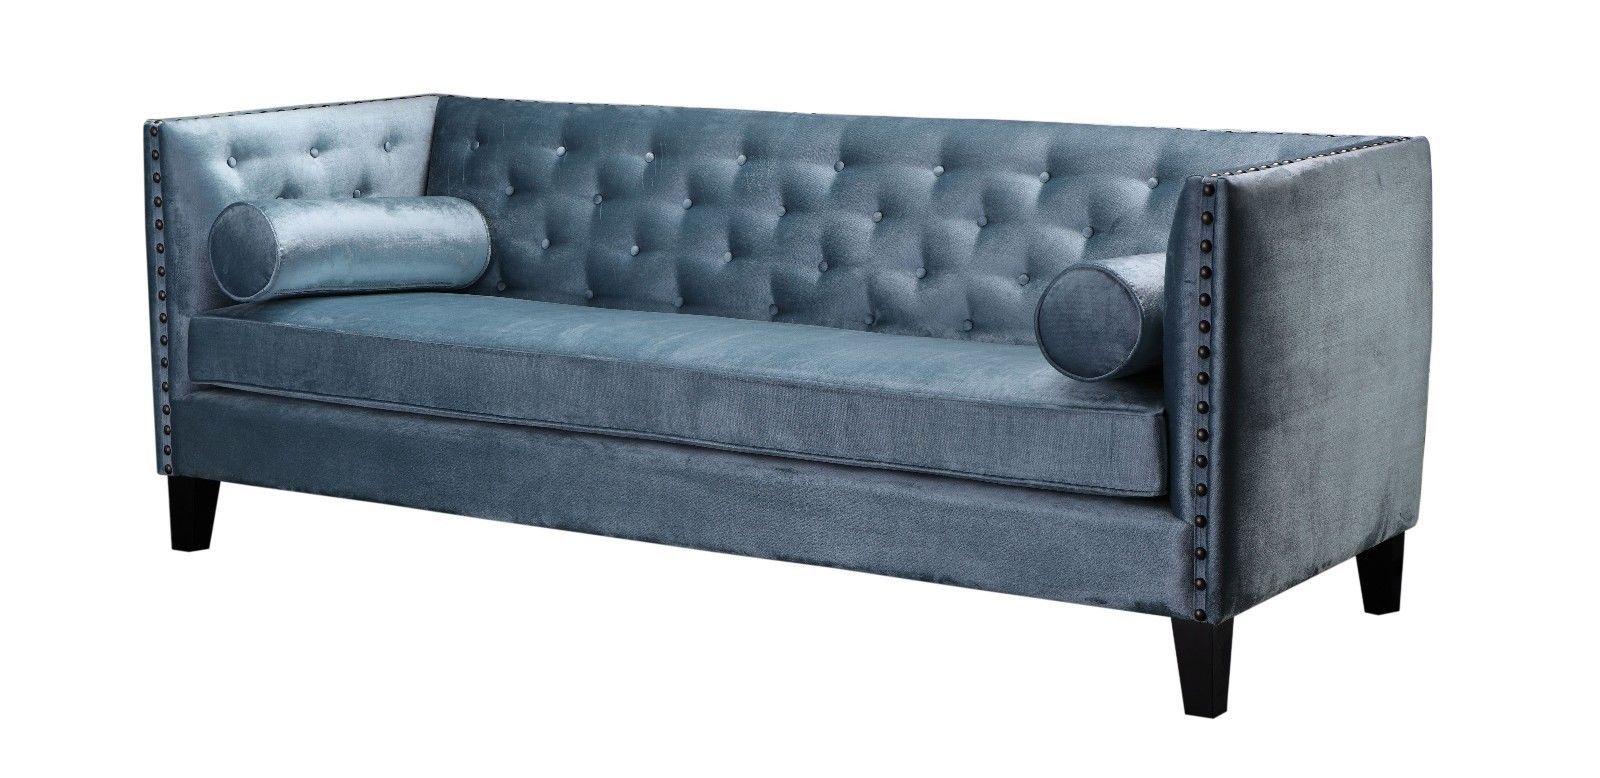 Henry Sofa Stoff Samt Blau Grau 3 Sitzer Couch Stoff Bezug Stoff Sofa In Mobel Amp Wohnen Mobel Sofas Amp Sessel Sofa Lounge Sofa Stoff Woody Mobel